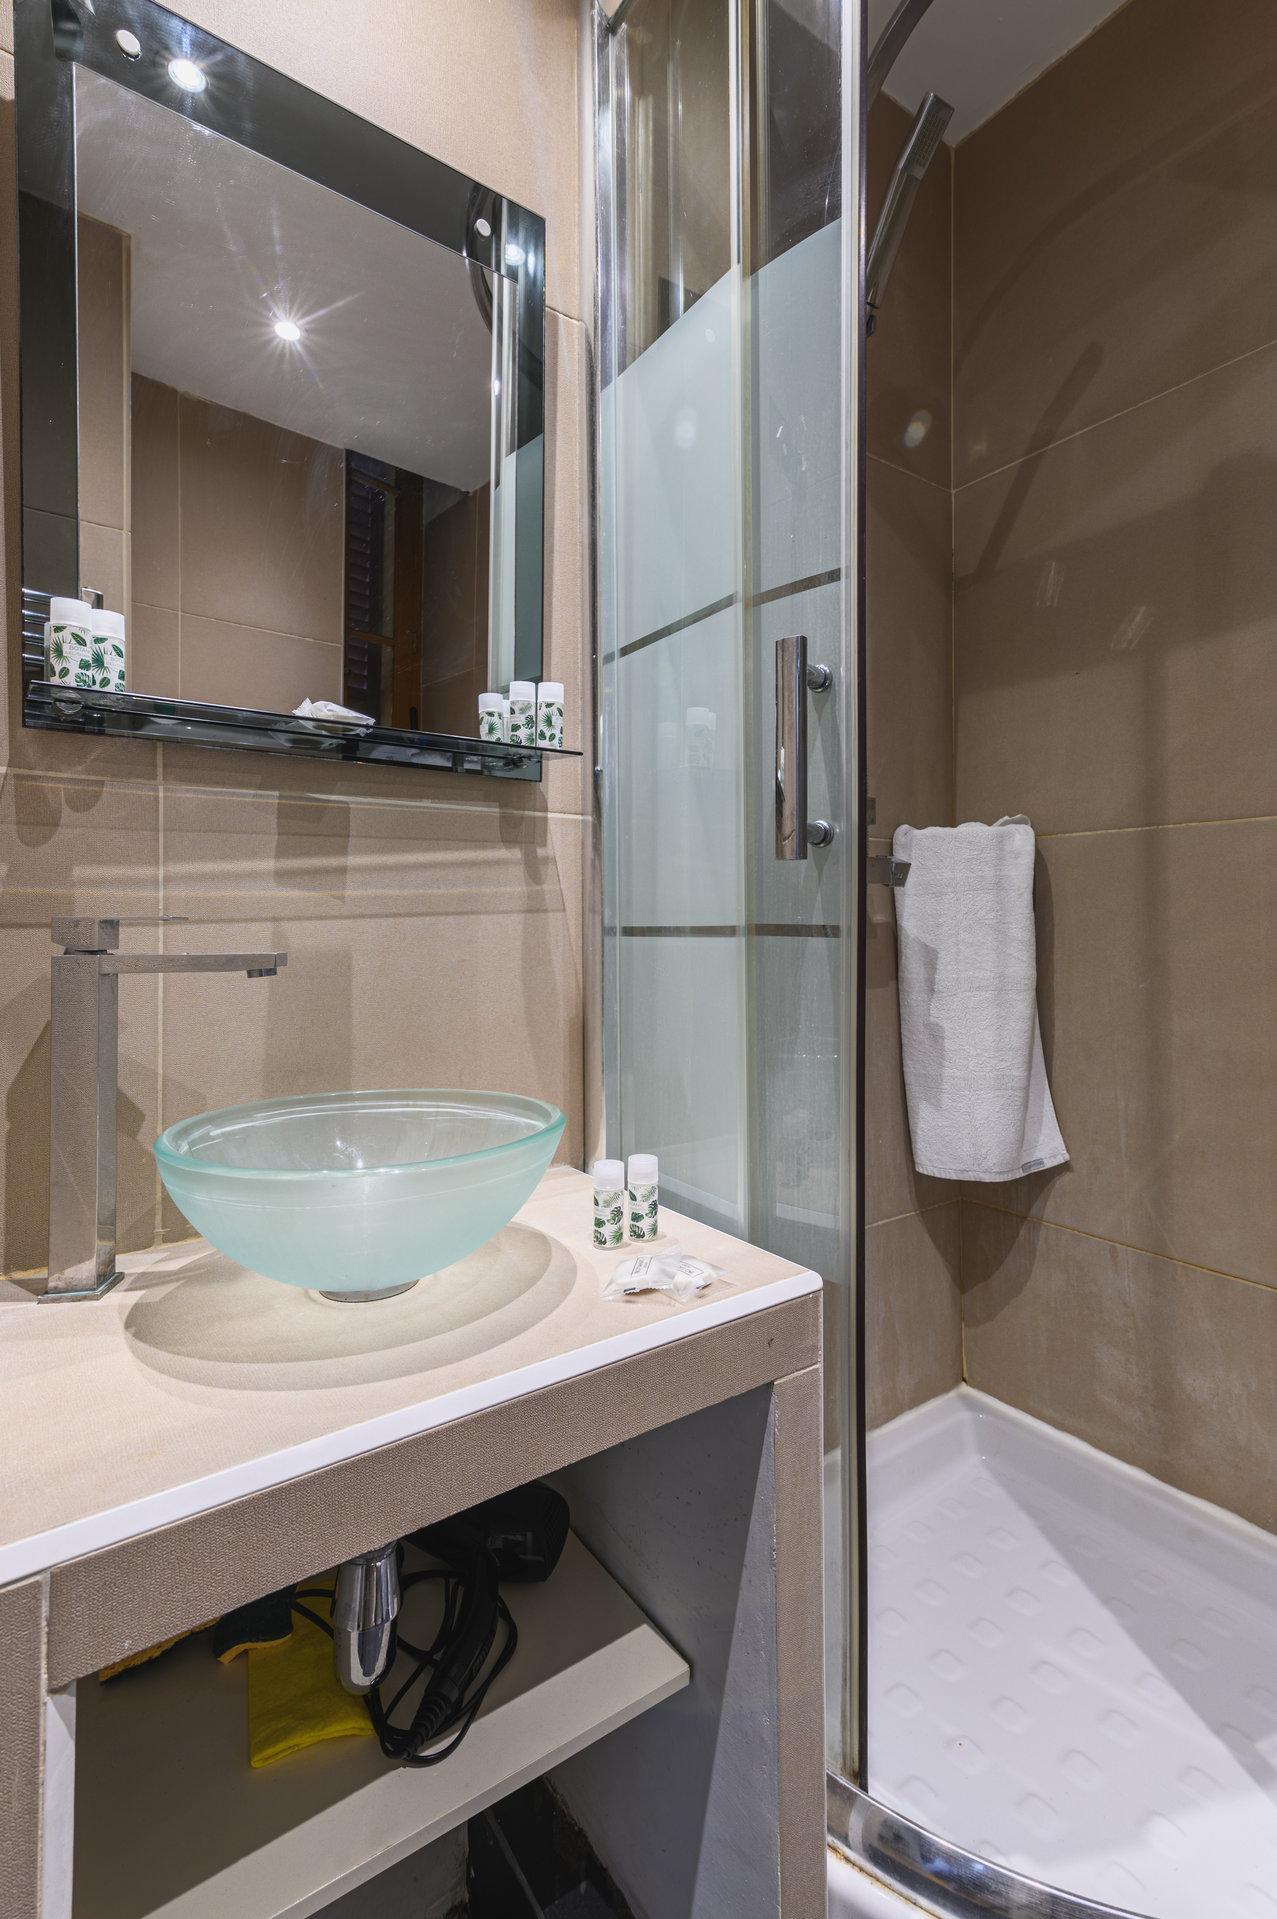 Vieux-Nice - 2 apartments (2p + studio) - Ideal investment!